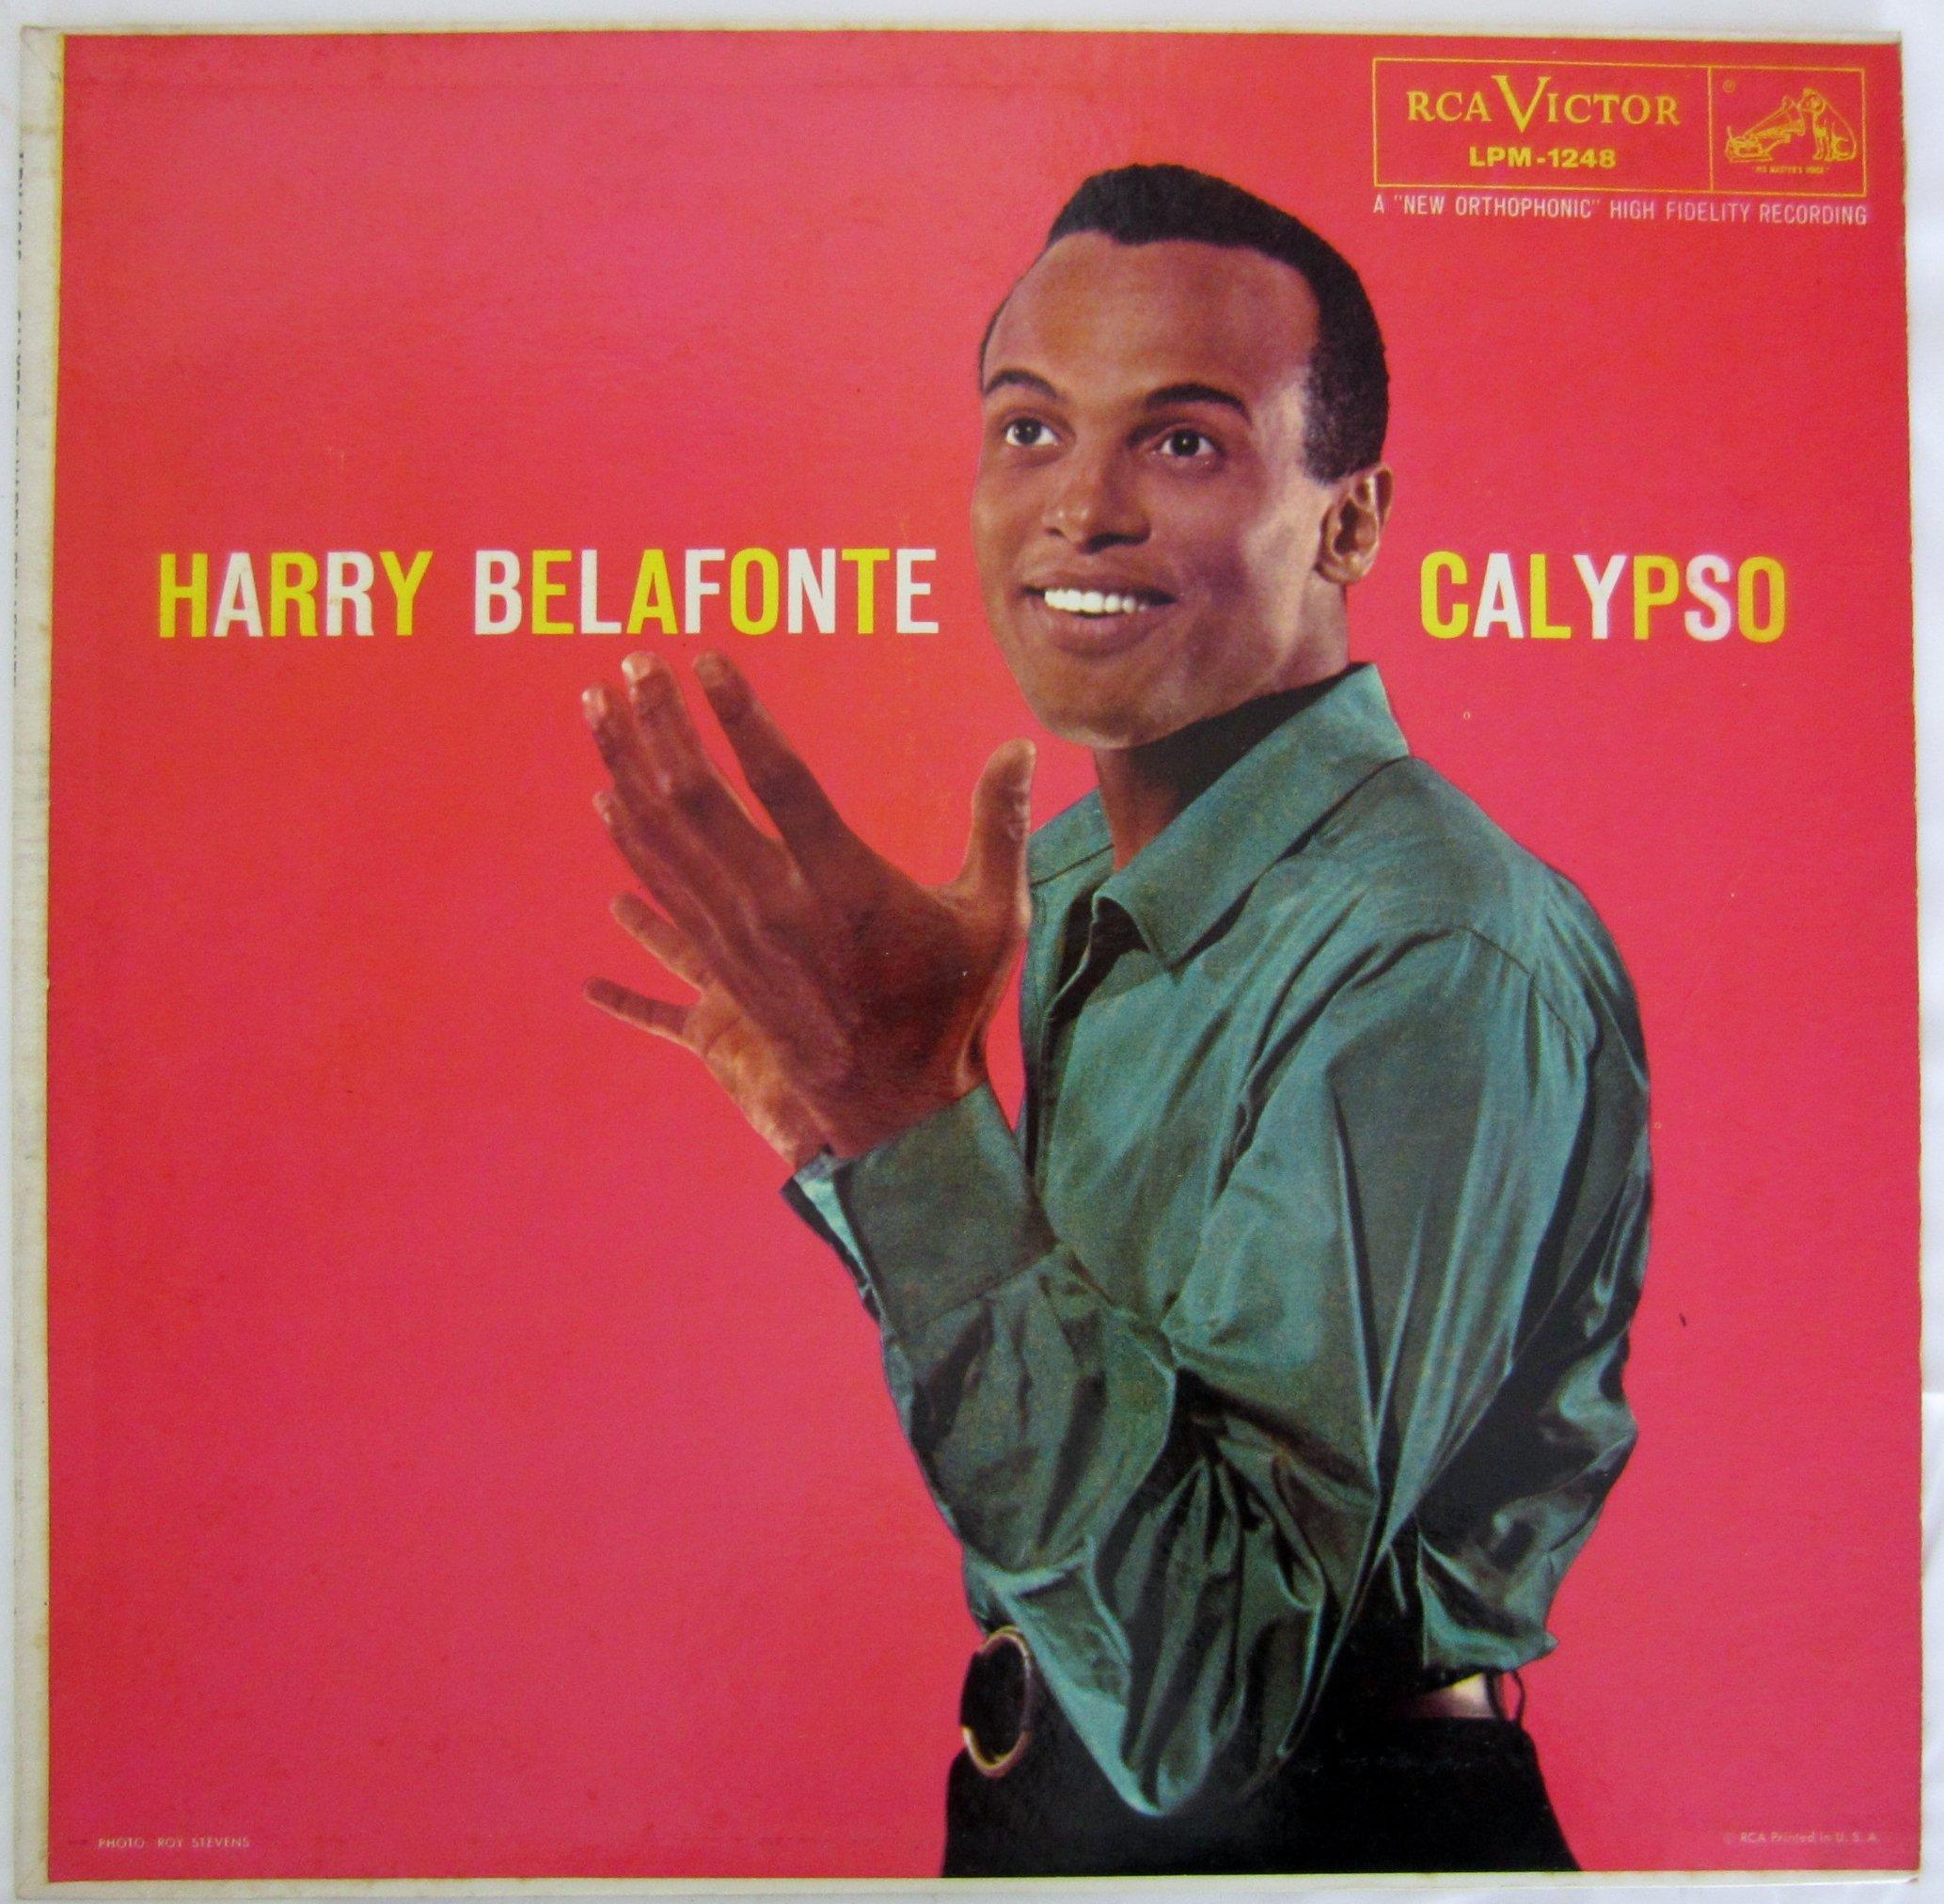 Calypso by RCA Victor